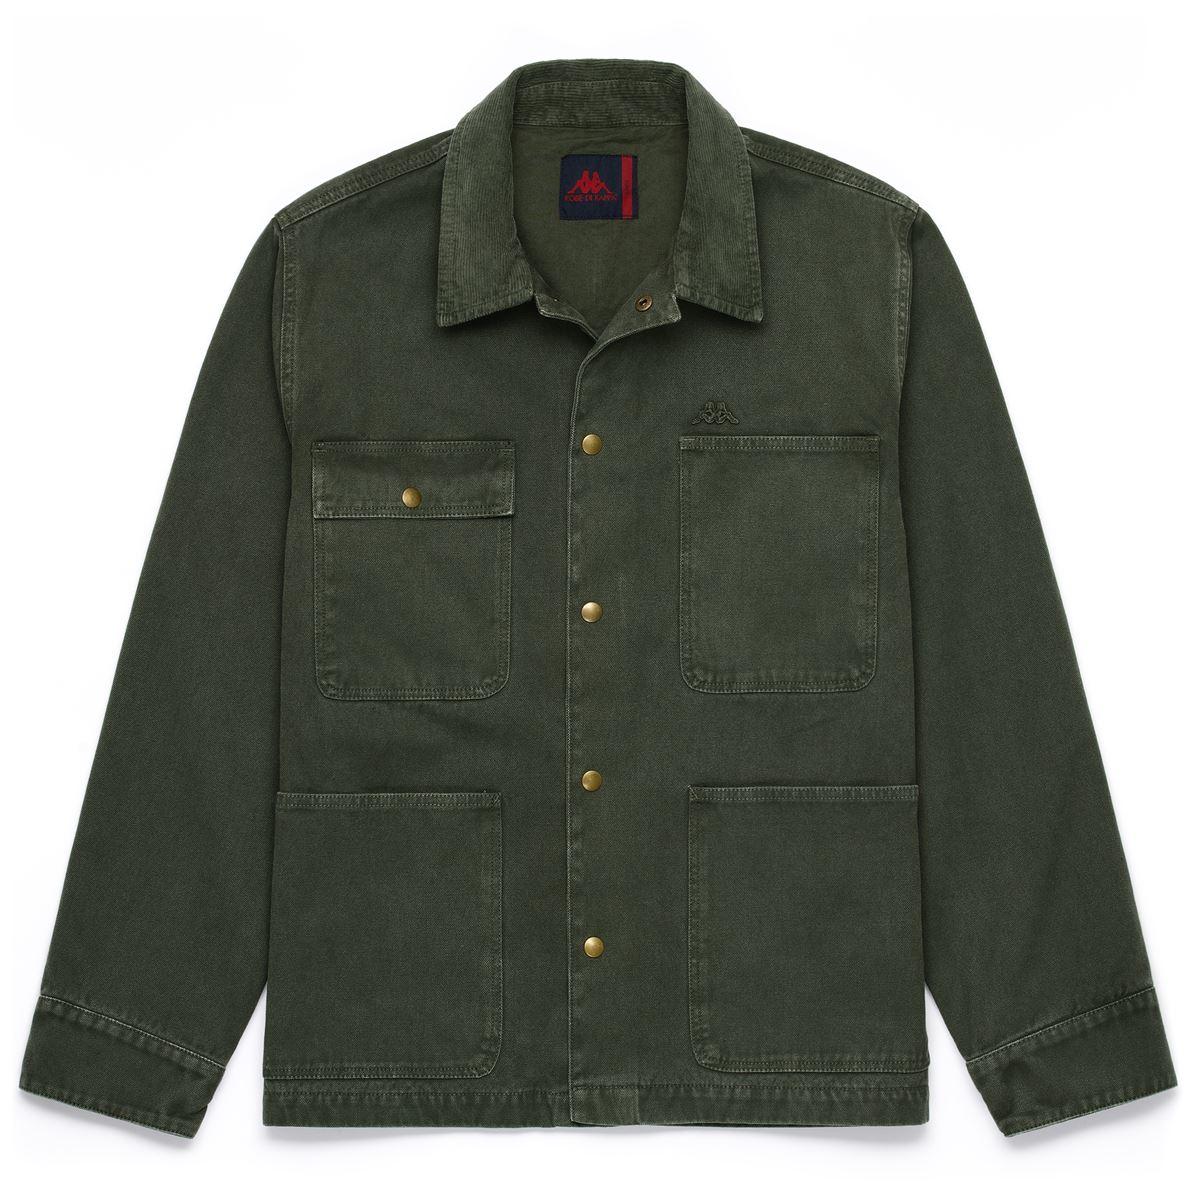 Robe di Kappa Giubbotti uomo-641184W